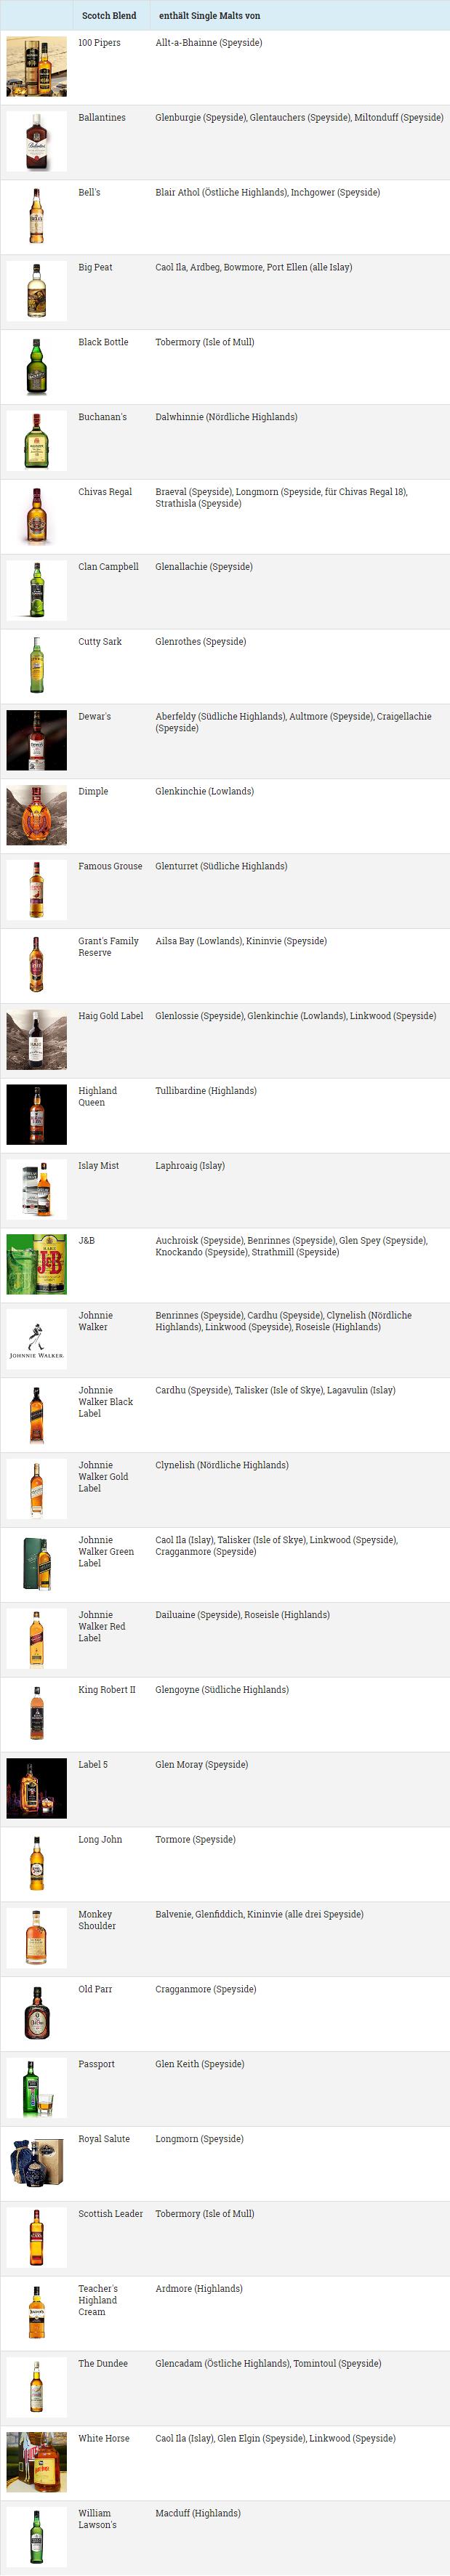 Single Malts in Scotch Whiskys als Liste (Grafik: Alkoblog)